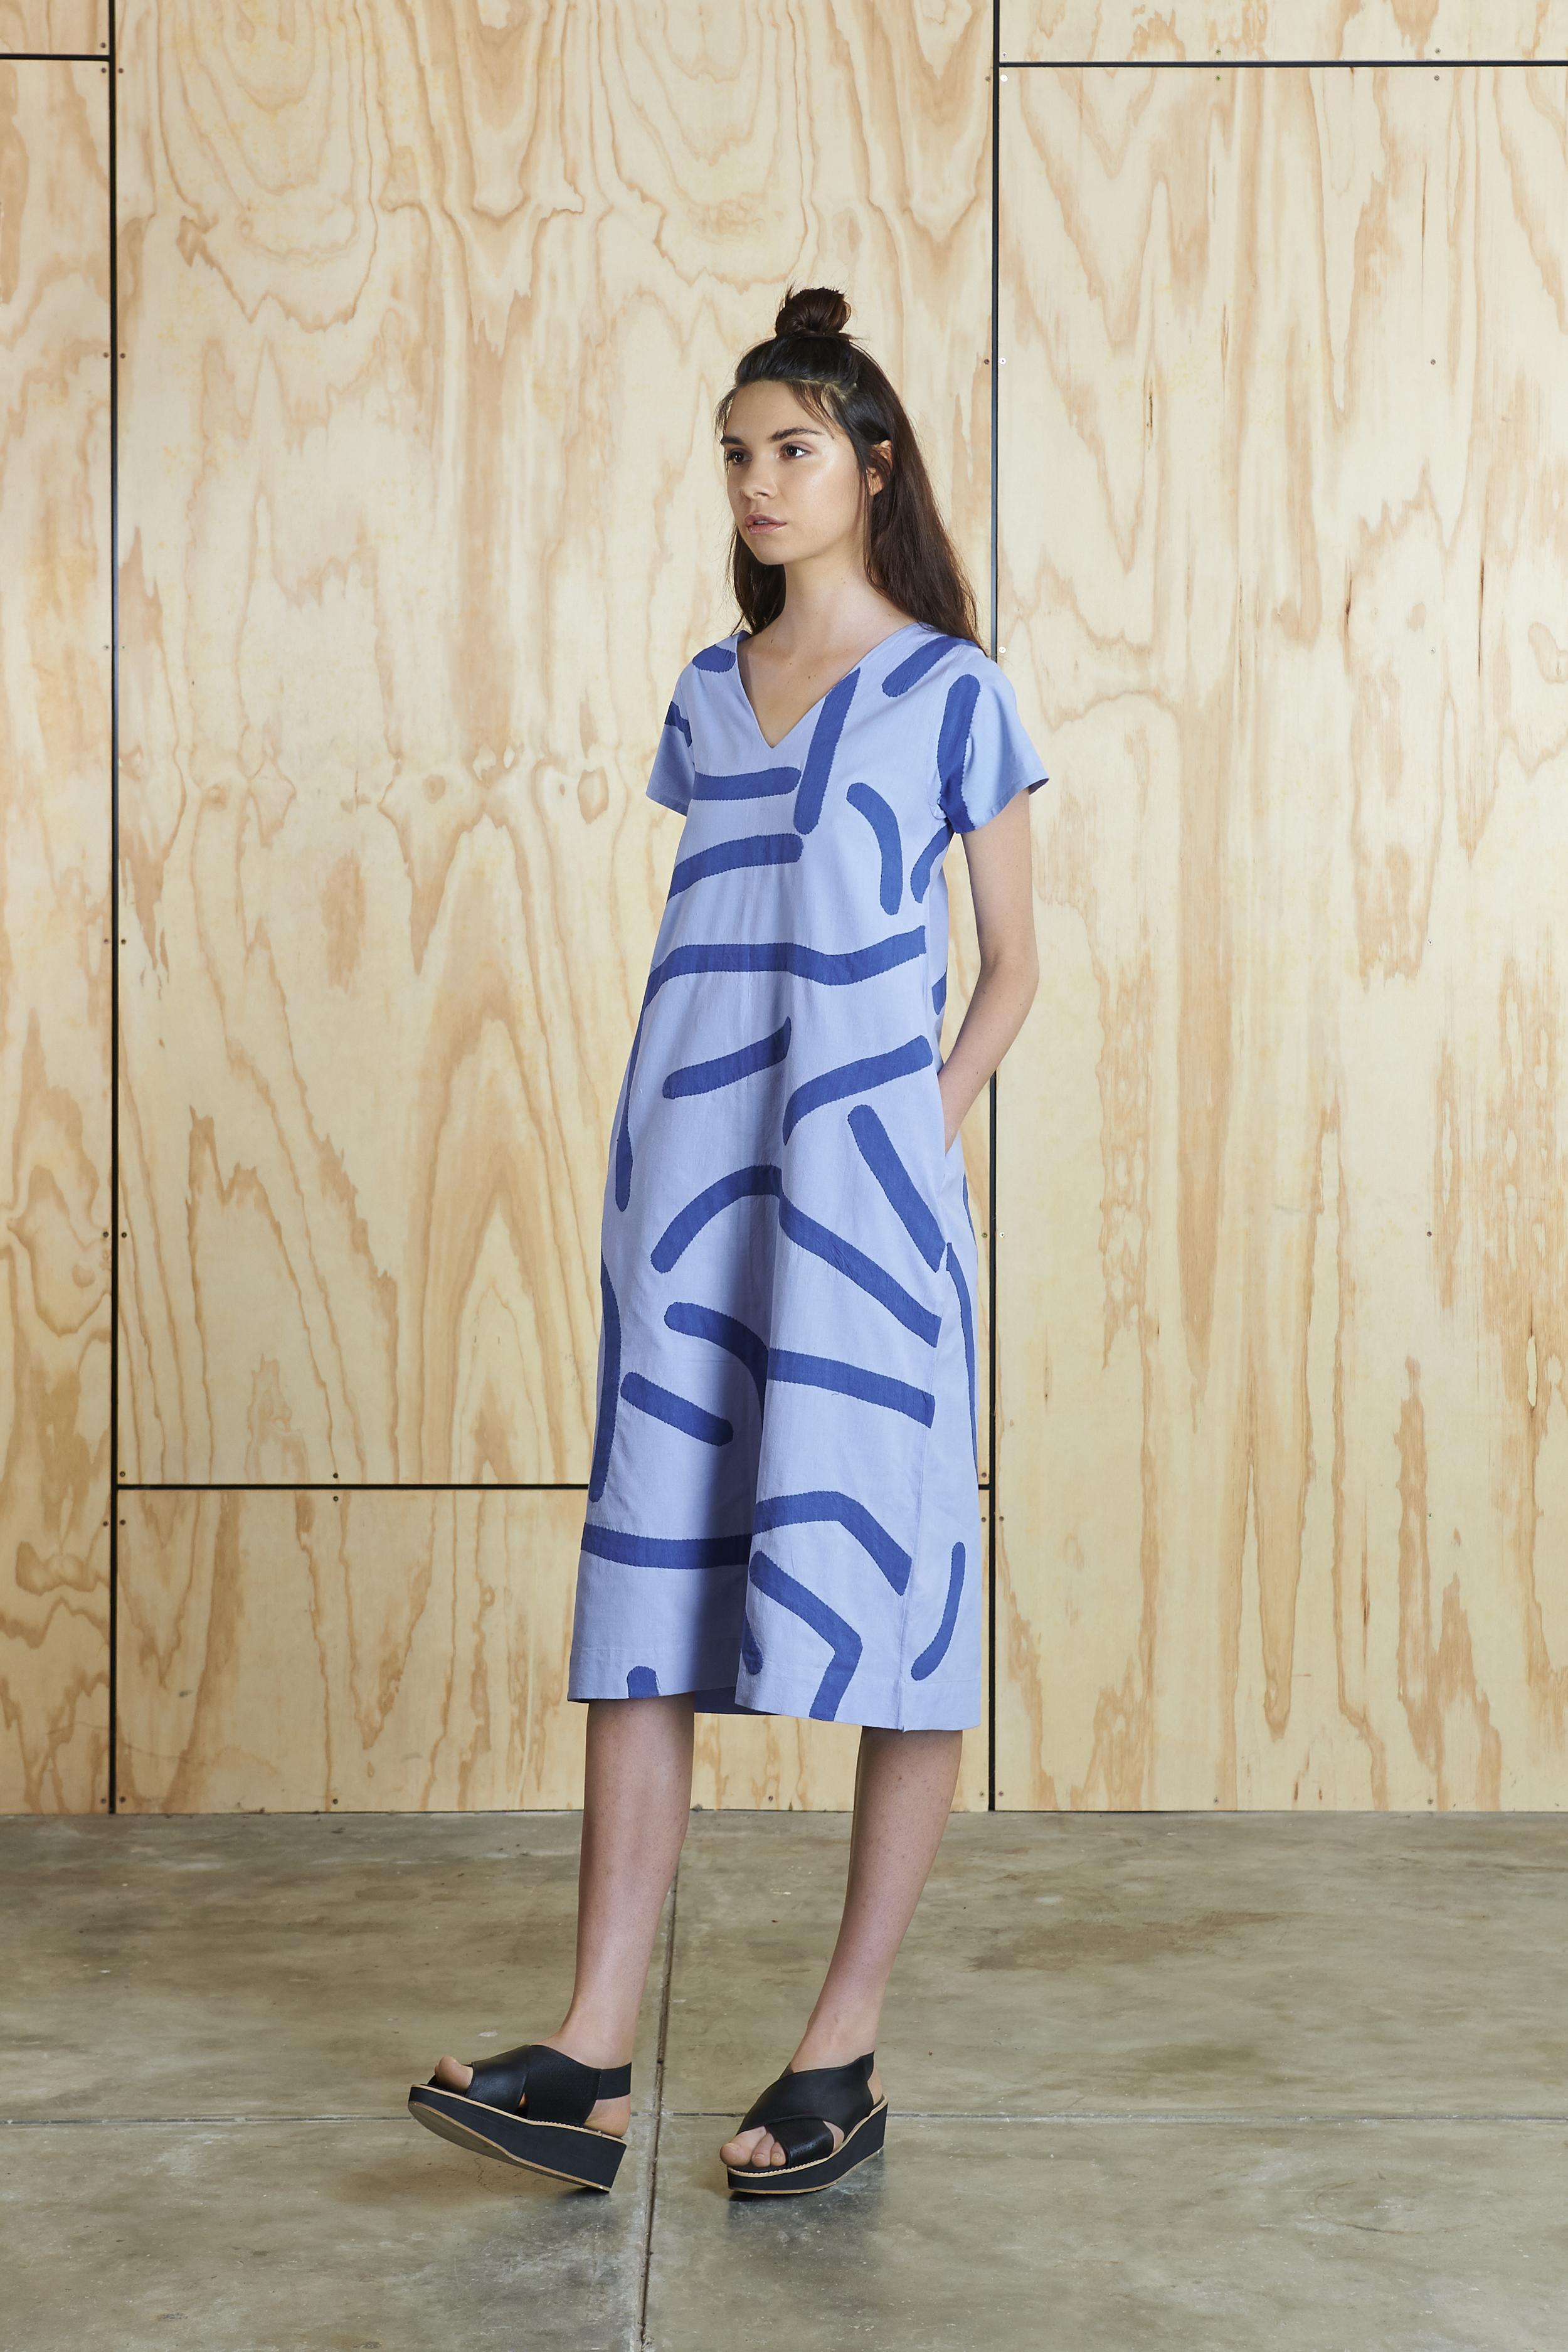 Big Creases Dress in Light Violet/Blue  AUD $310